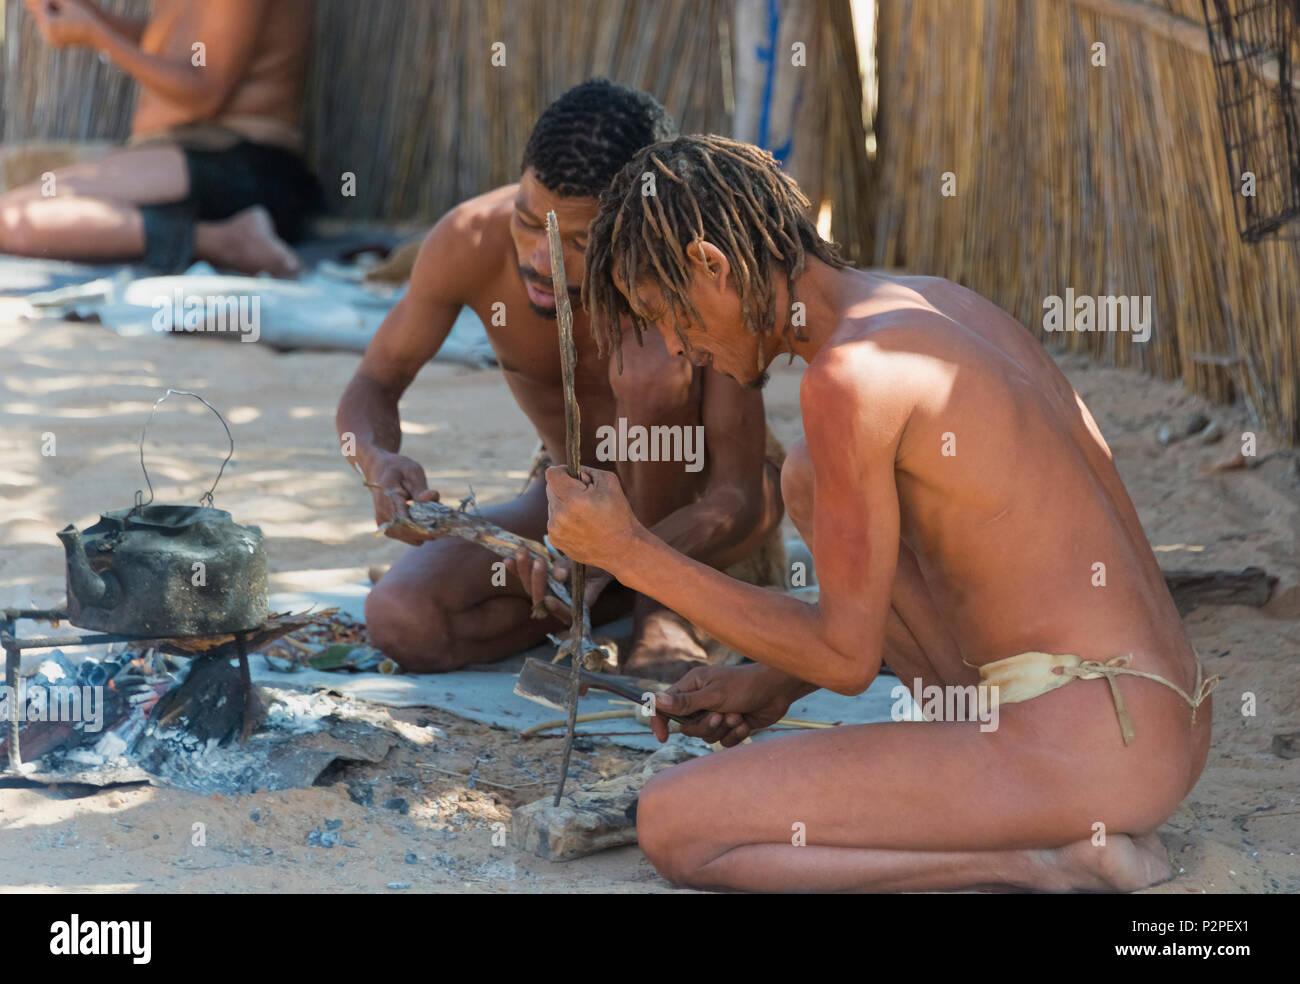 Bushman using animal bones to make jewelry in the village, Kgalagadi Transfrontier Park, South Africa - Stock Image